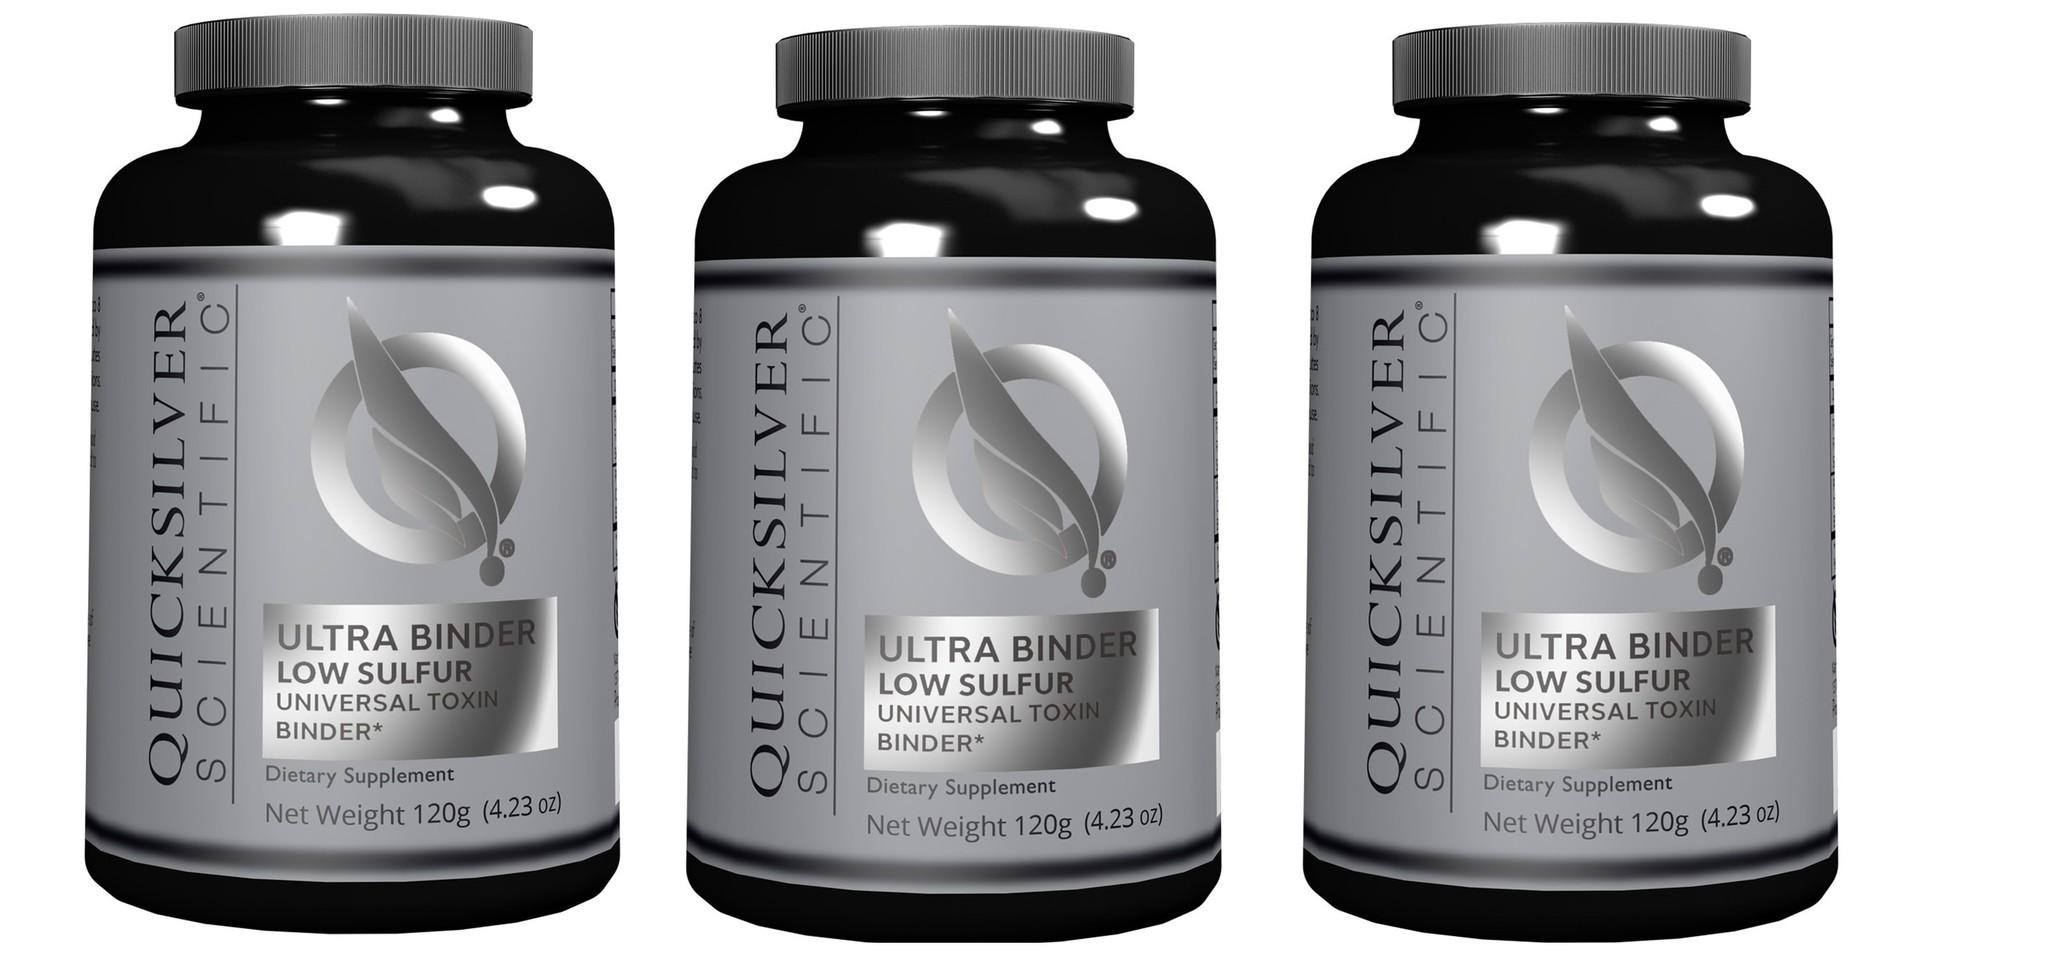 Quicksilver Scientific Ultra Binder Low Sulfur, Universal Toxin Binder, 120 g, 3-packs